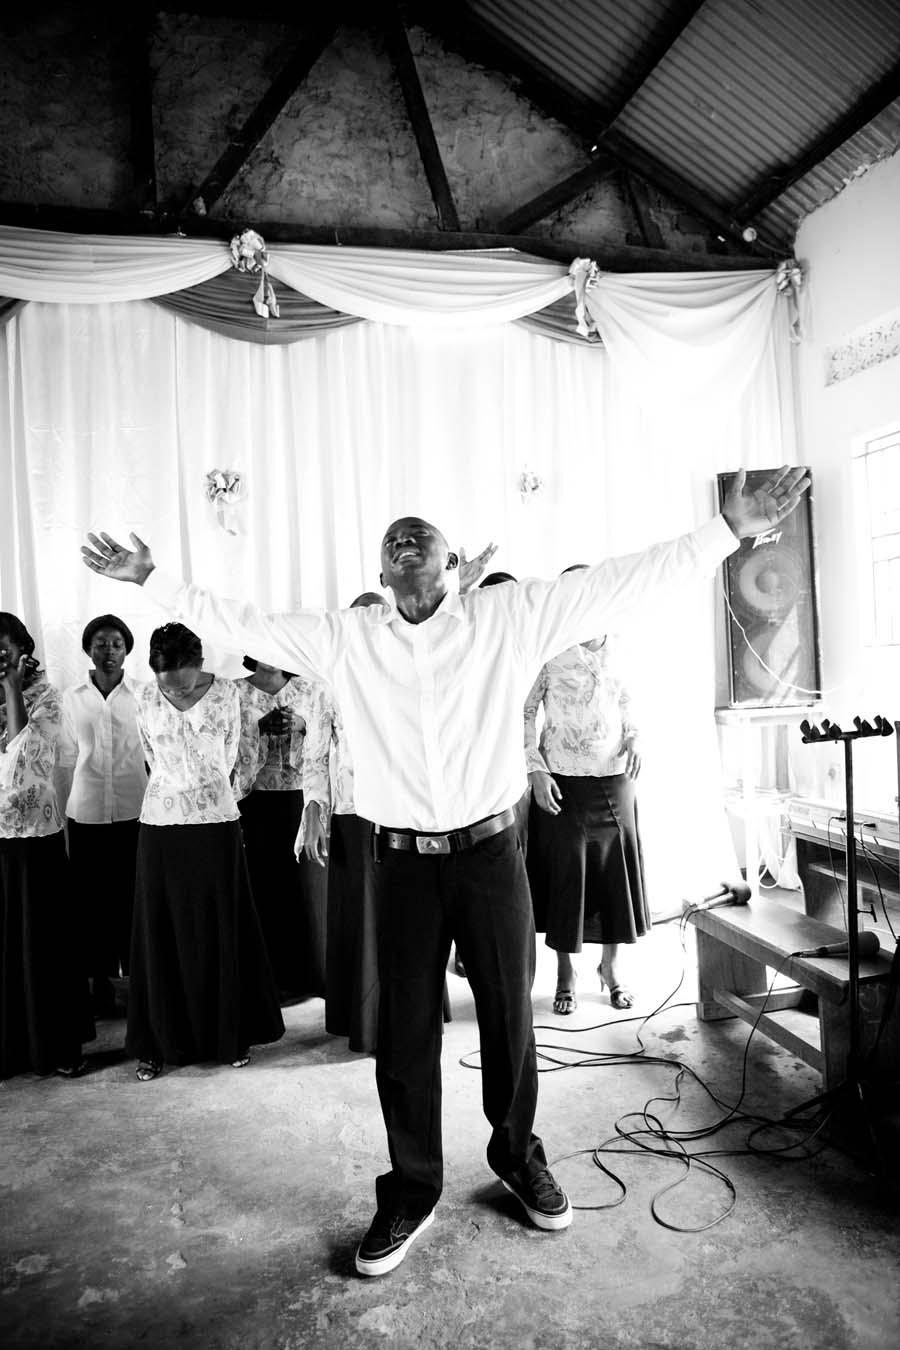 jessicadavisphotography.com | Jessica Davis Photography | Portrait Work in Uganda| Travel Photographer | World Event Photographs 9 (10).jpg